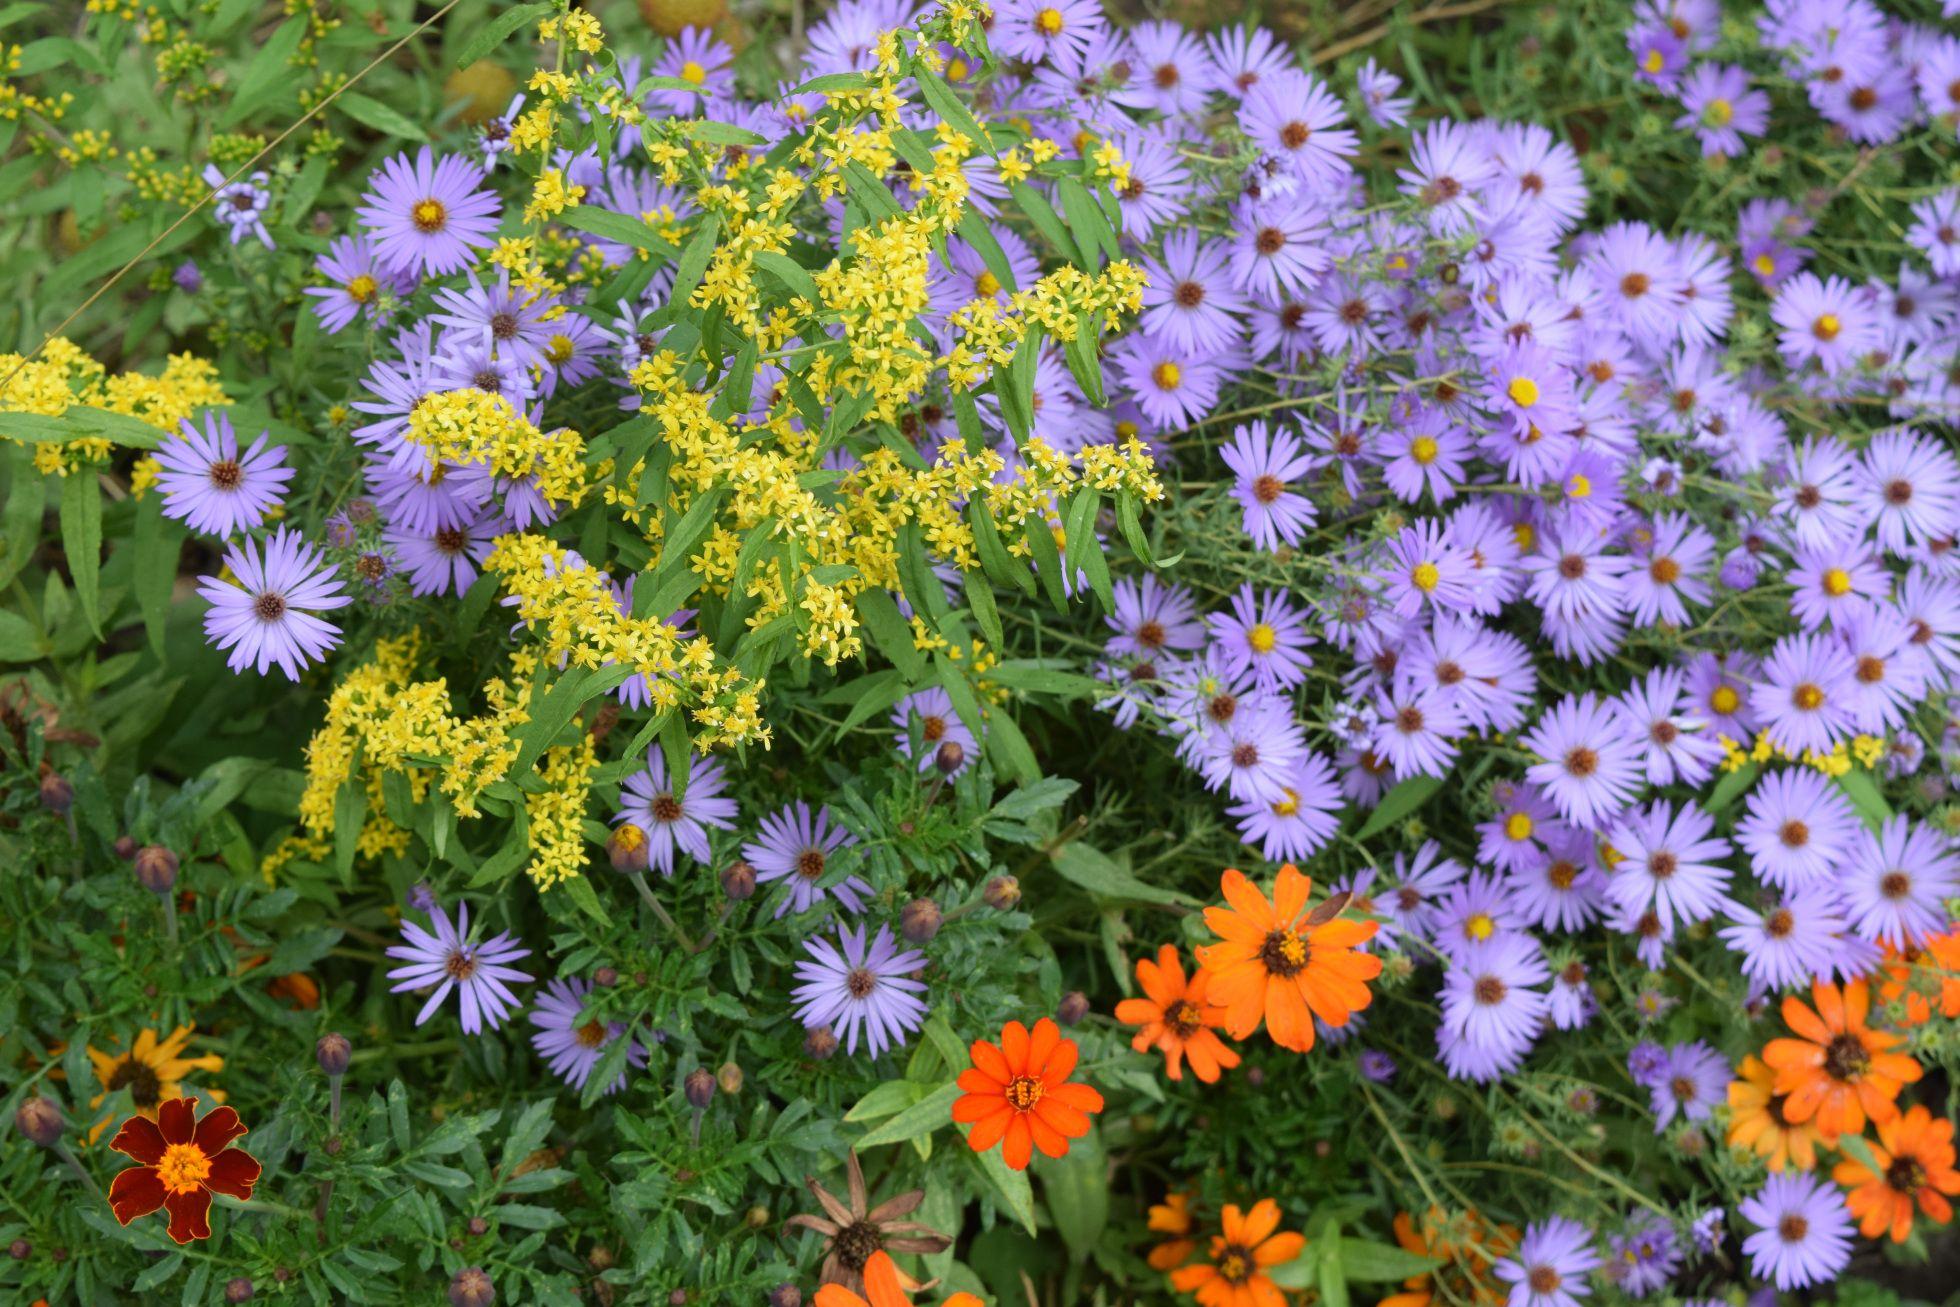 Companion Plants For Asters Plants Companion Planting Goldenrod Flower